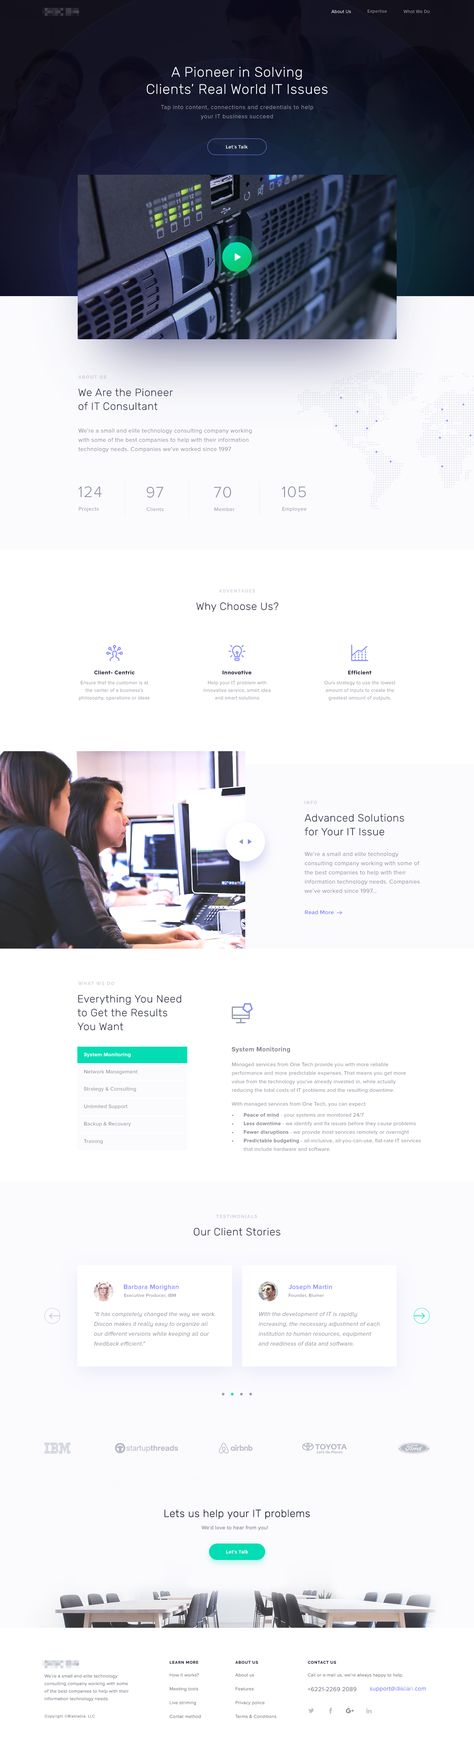 homepage_alt.png by Kukuh Andik